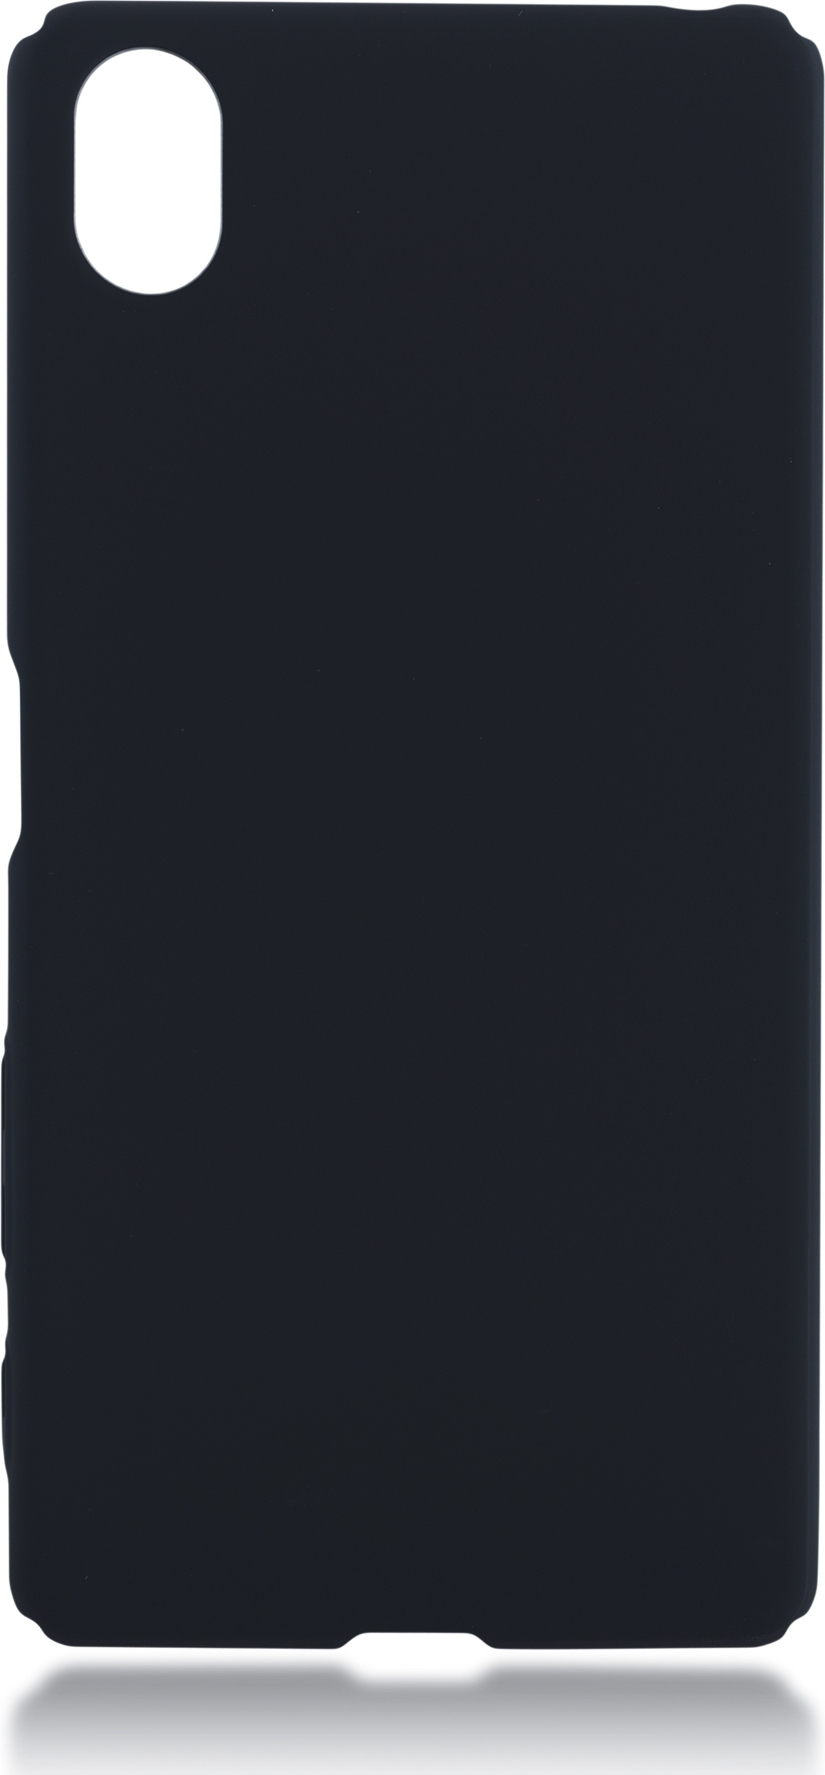 Чехол Brosco 4Side Soft-Touch для Sony Xperia X Perfomance, черный цена